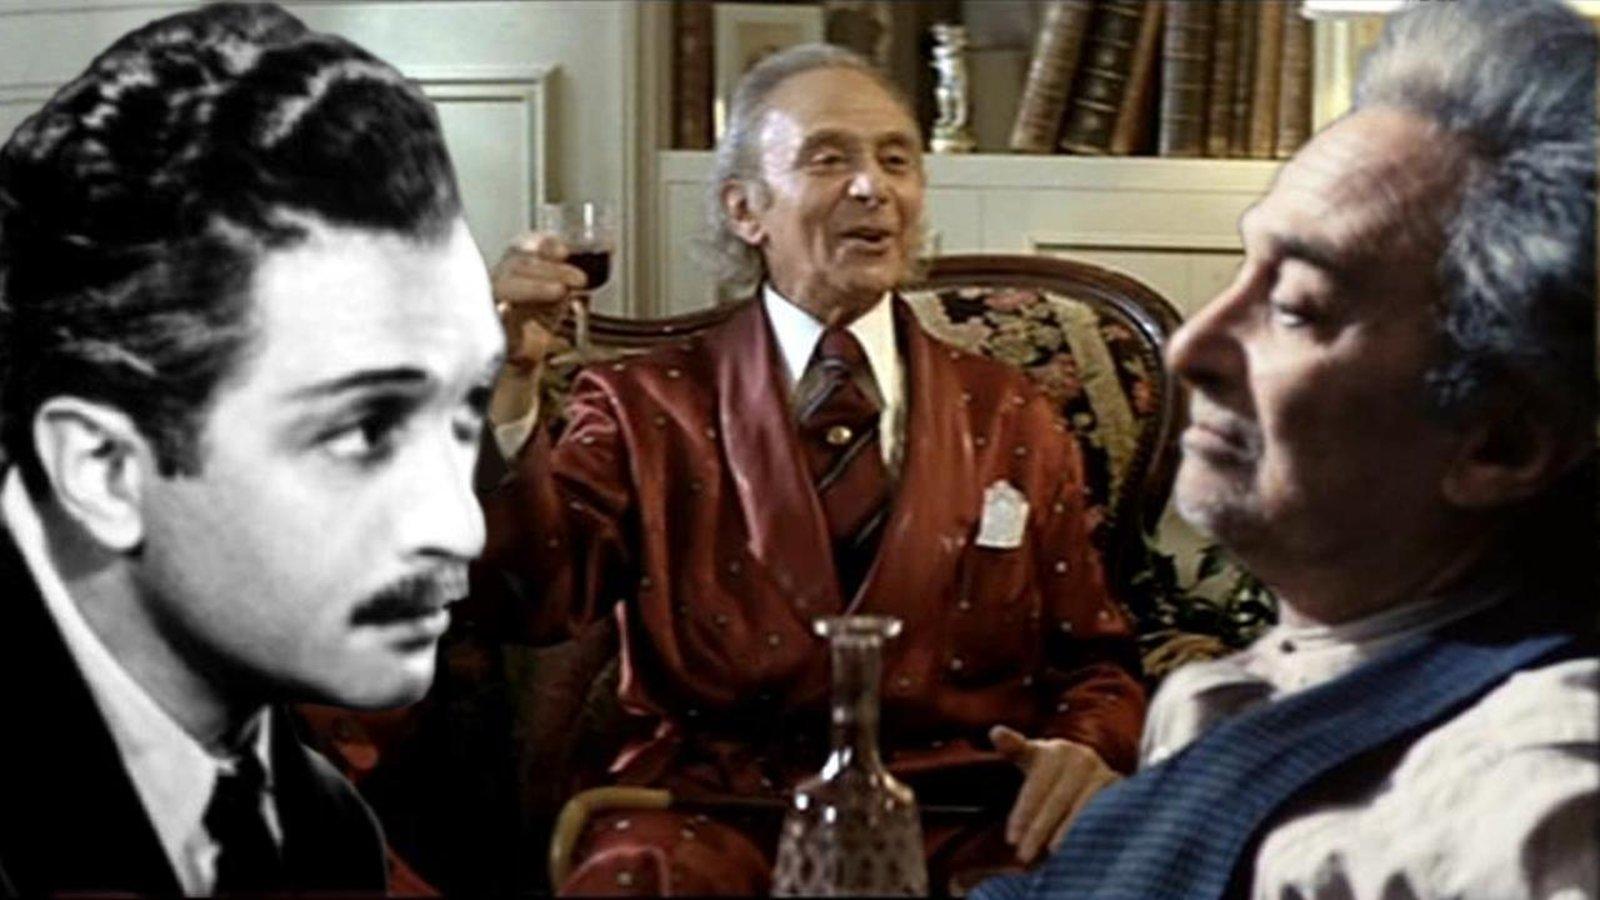 I, Dalio - The Dual Identities of French-Jewish Actor Marcel Dalio